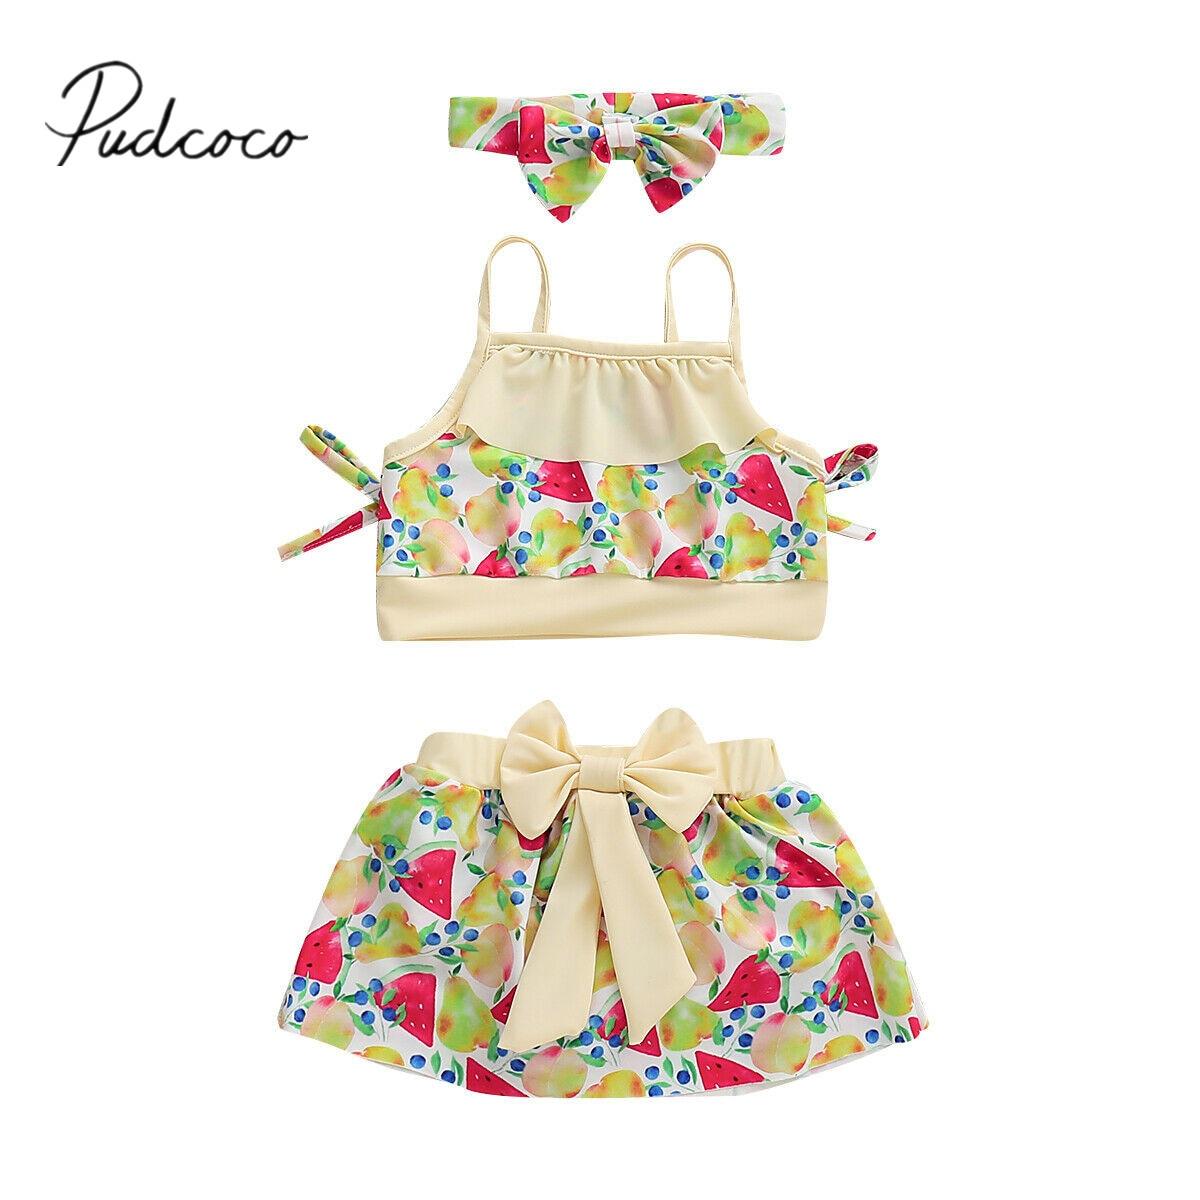 2019 Brand New Summer Kids Baby Girl Bikini Set Fruit Printing Swimsuit Swimwear Bathing Suit -9543